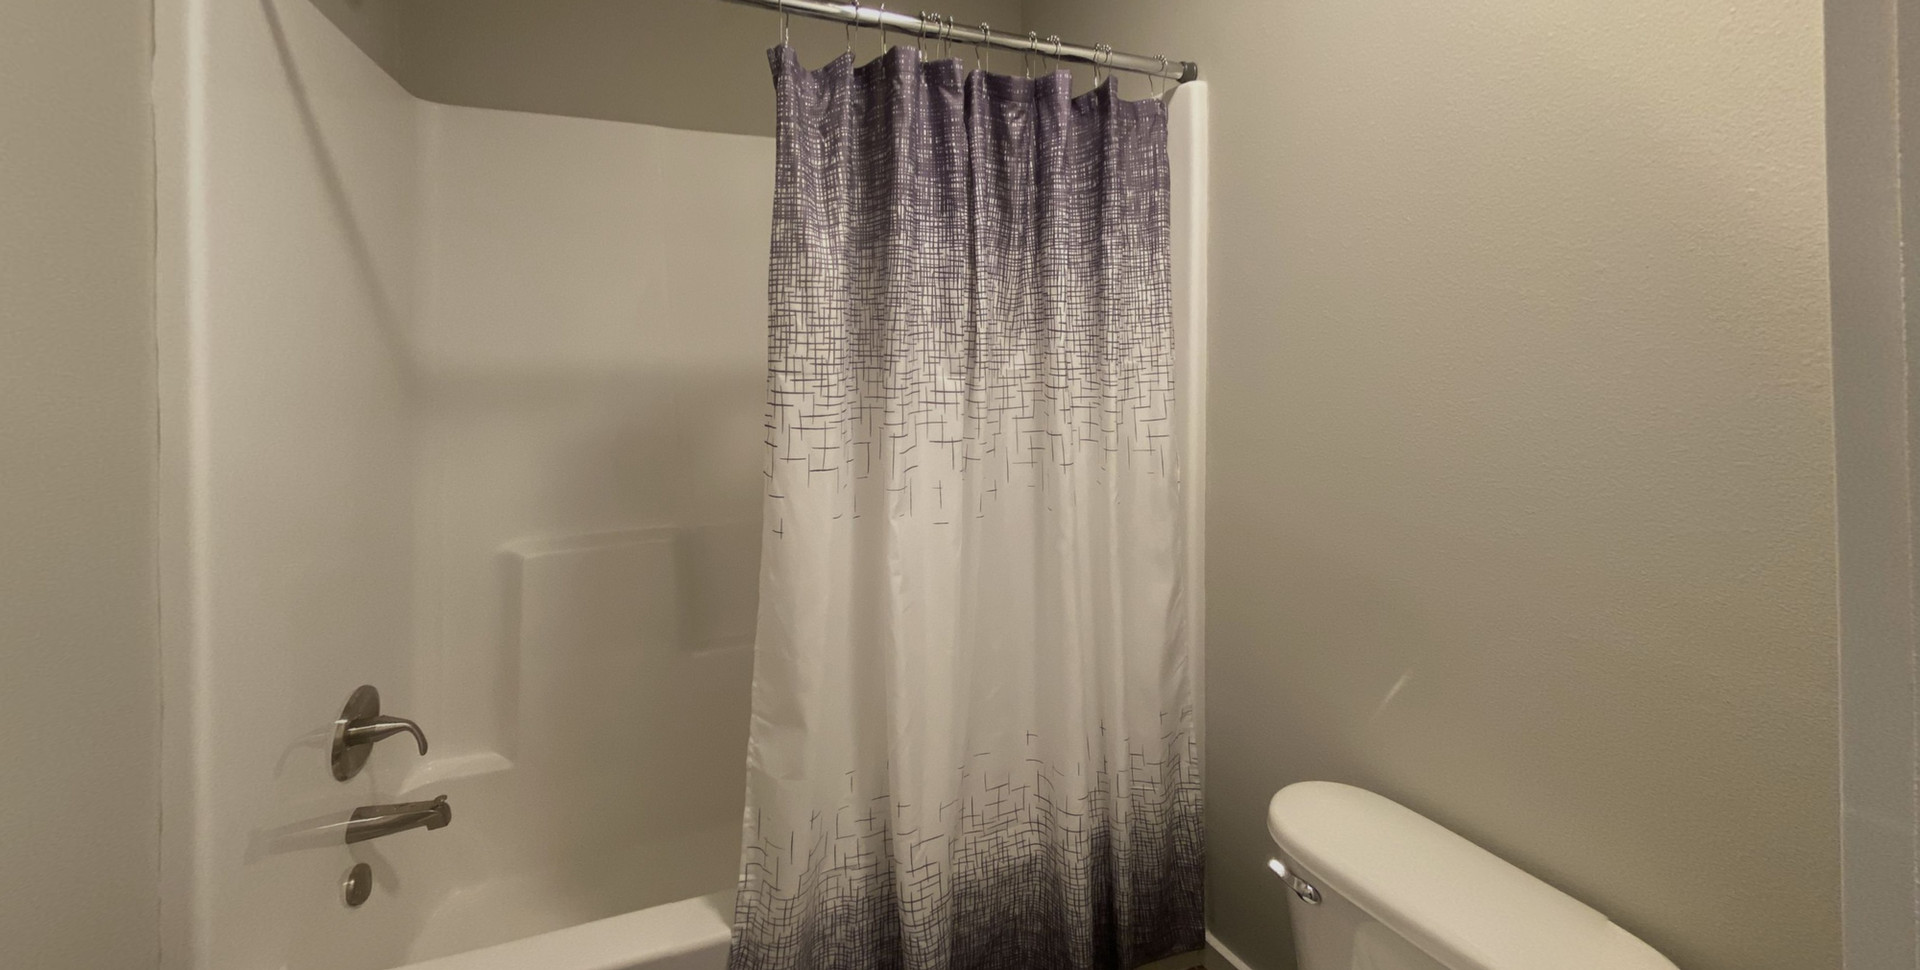 310-Omnia-Bathroom.jpg